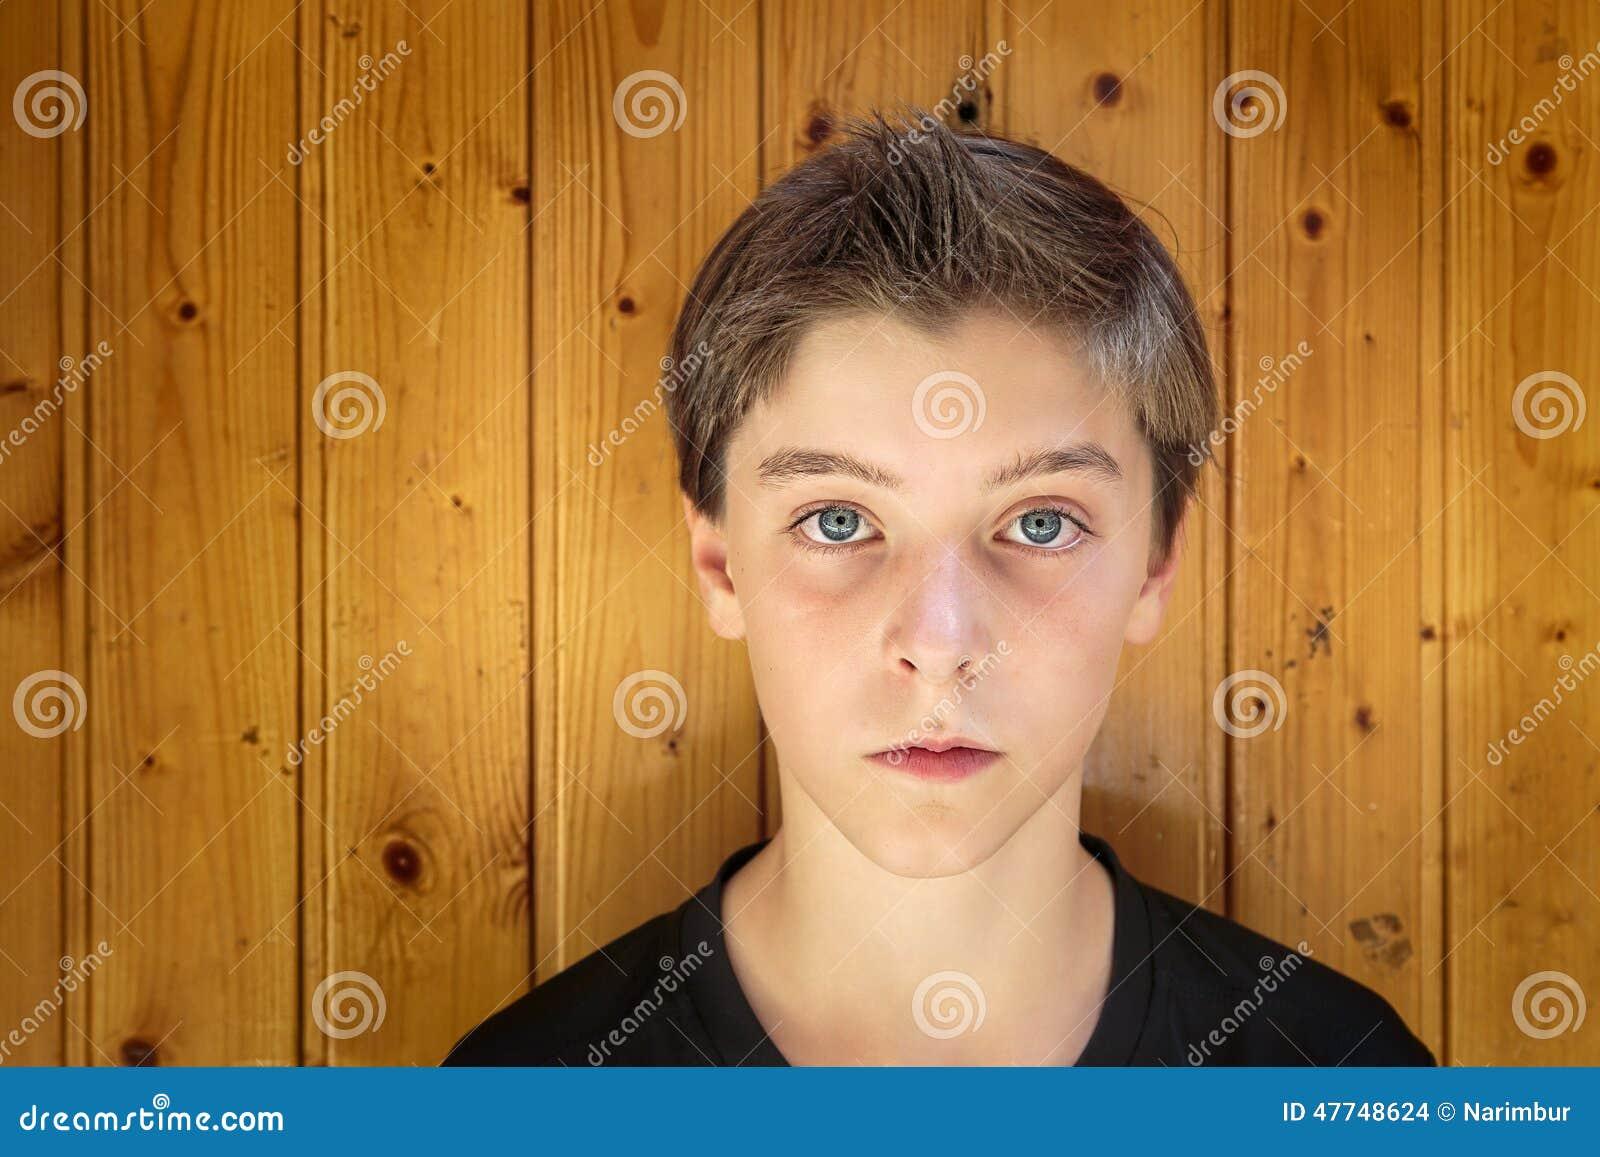 Portrait of a beautiful teenage boy